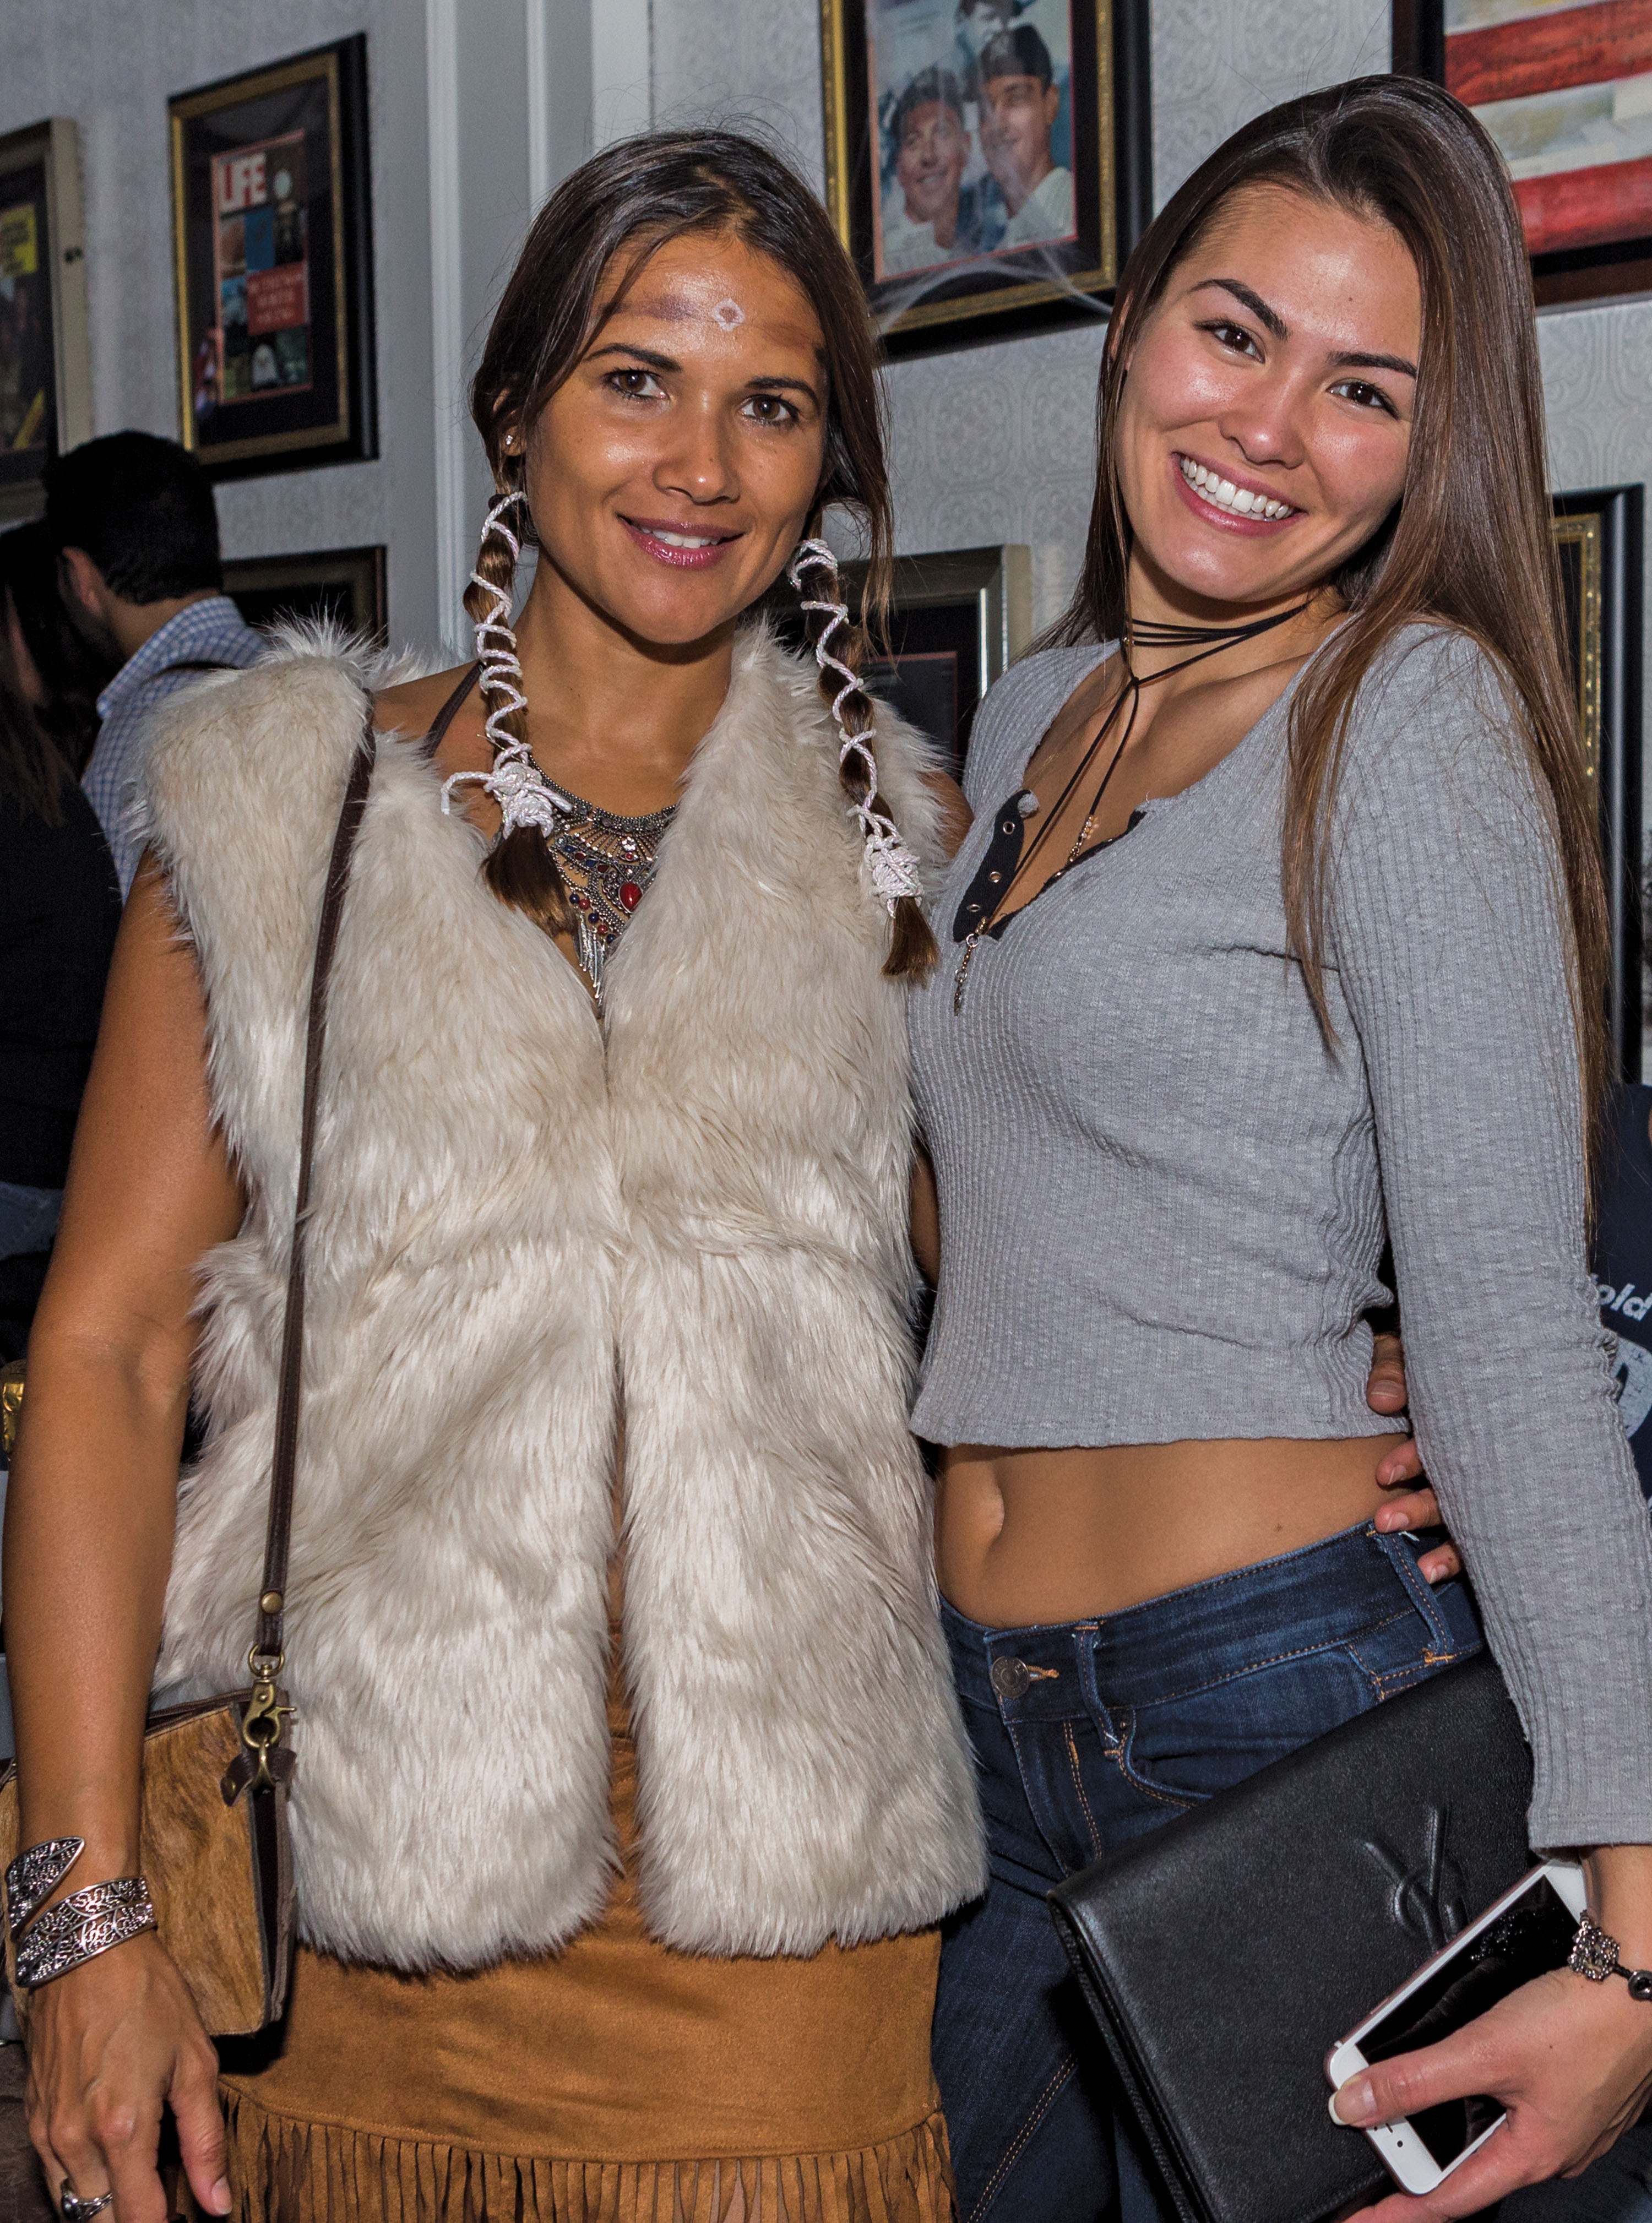 sarah-mietlicki-noelle-marie-american-social-bar-restaurant-fort-lauderdale-venice-magazine